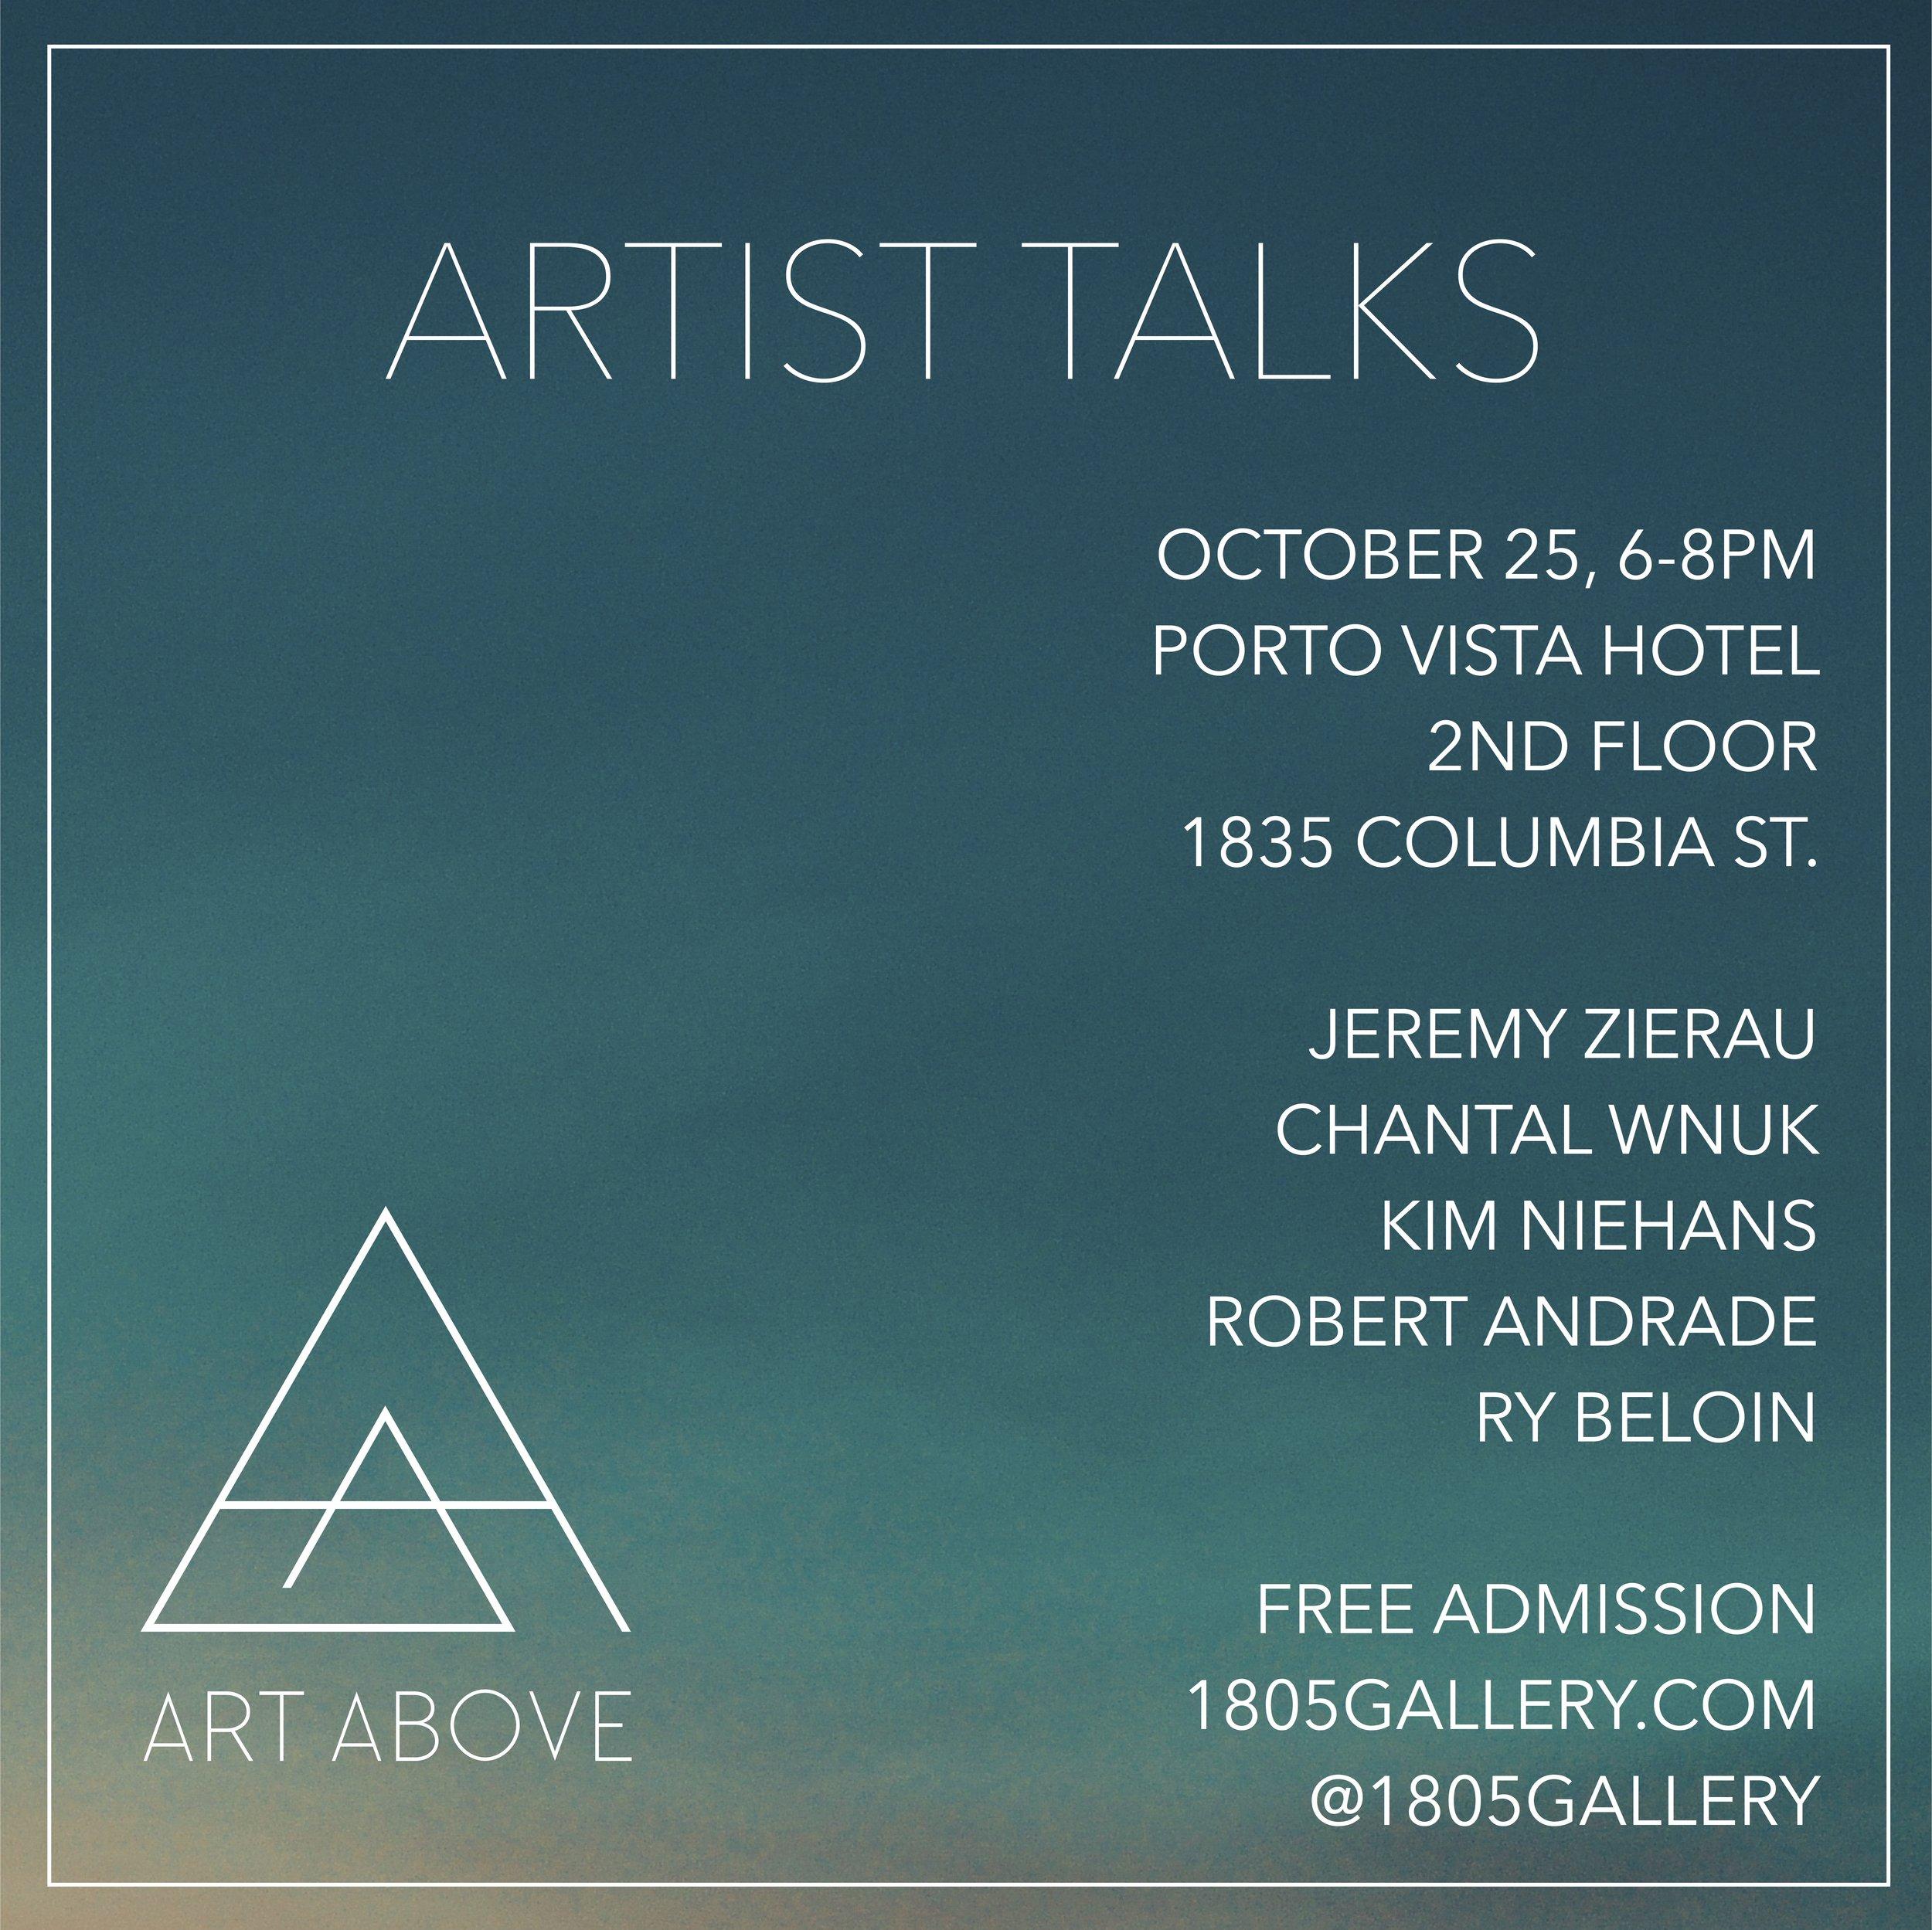 ArtistTalks_flyer.JPEG